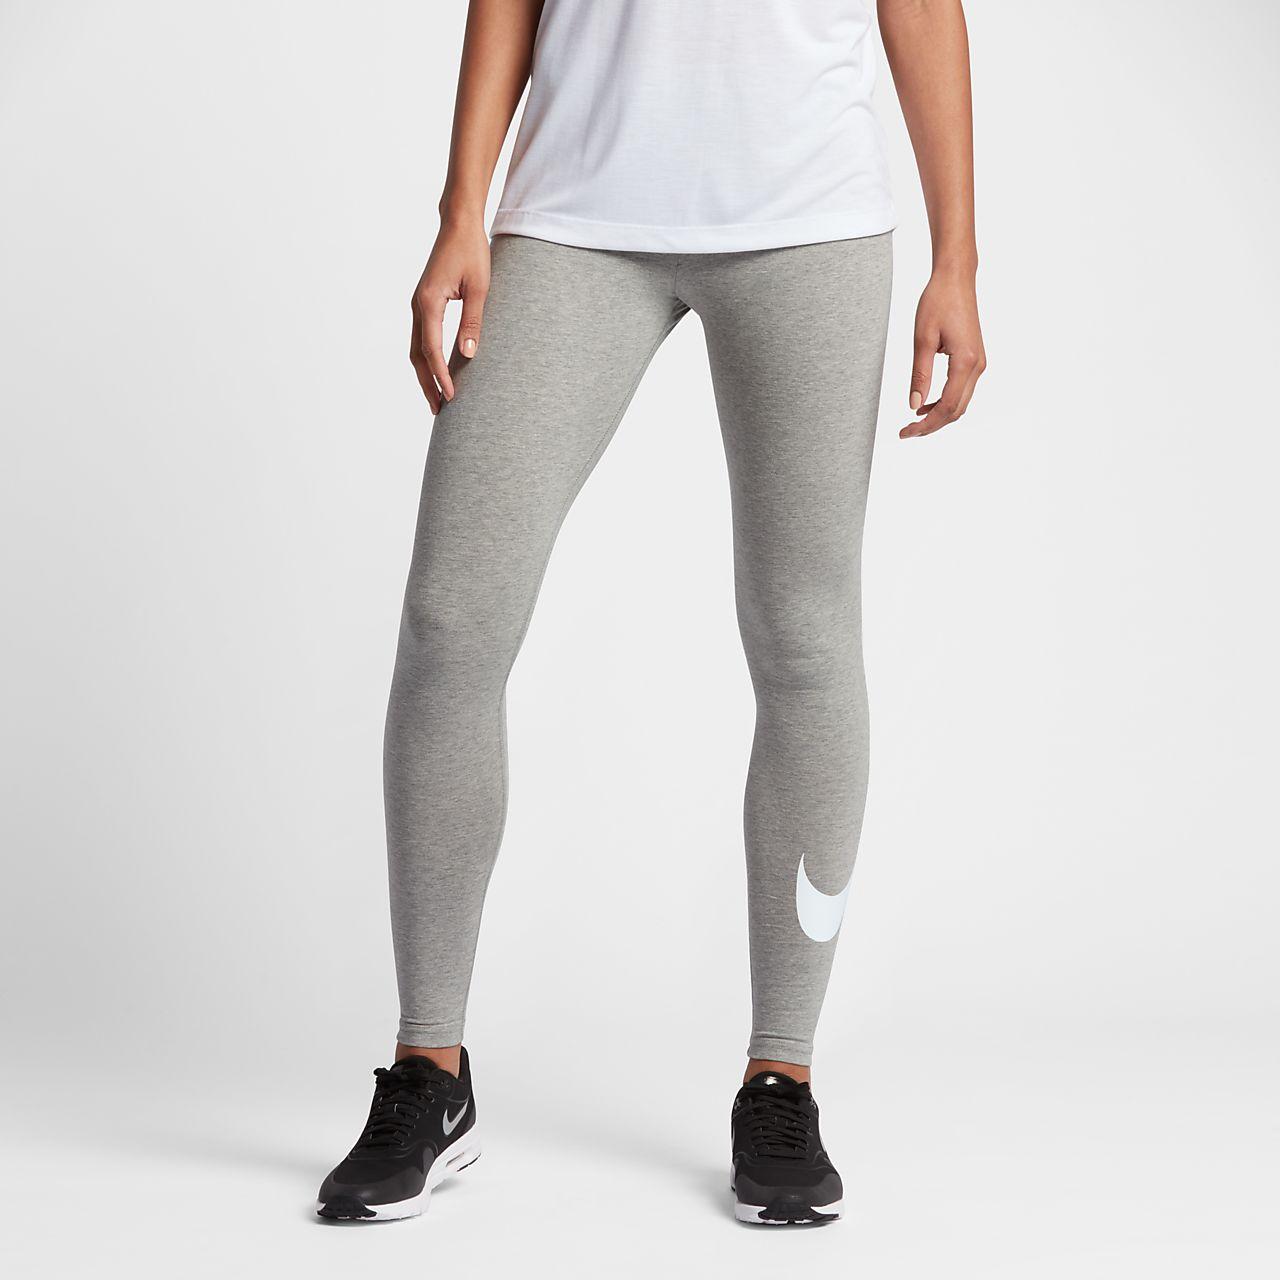 8569753e37c6ee Nike Sportswear Women's Swoosh Leggings. Nike.com GB